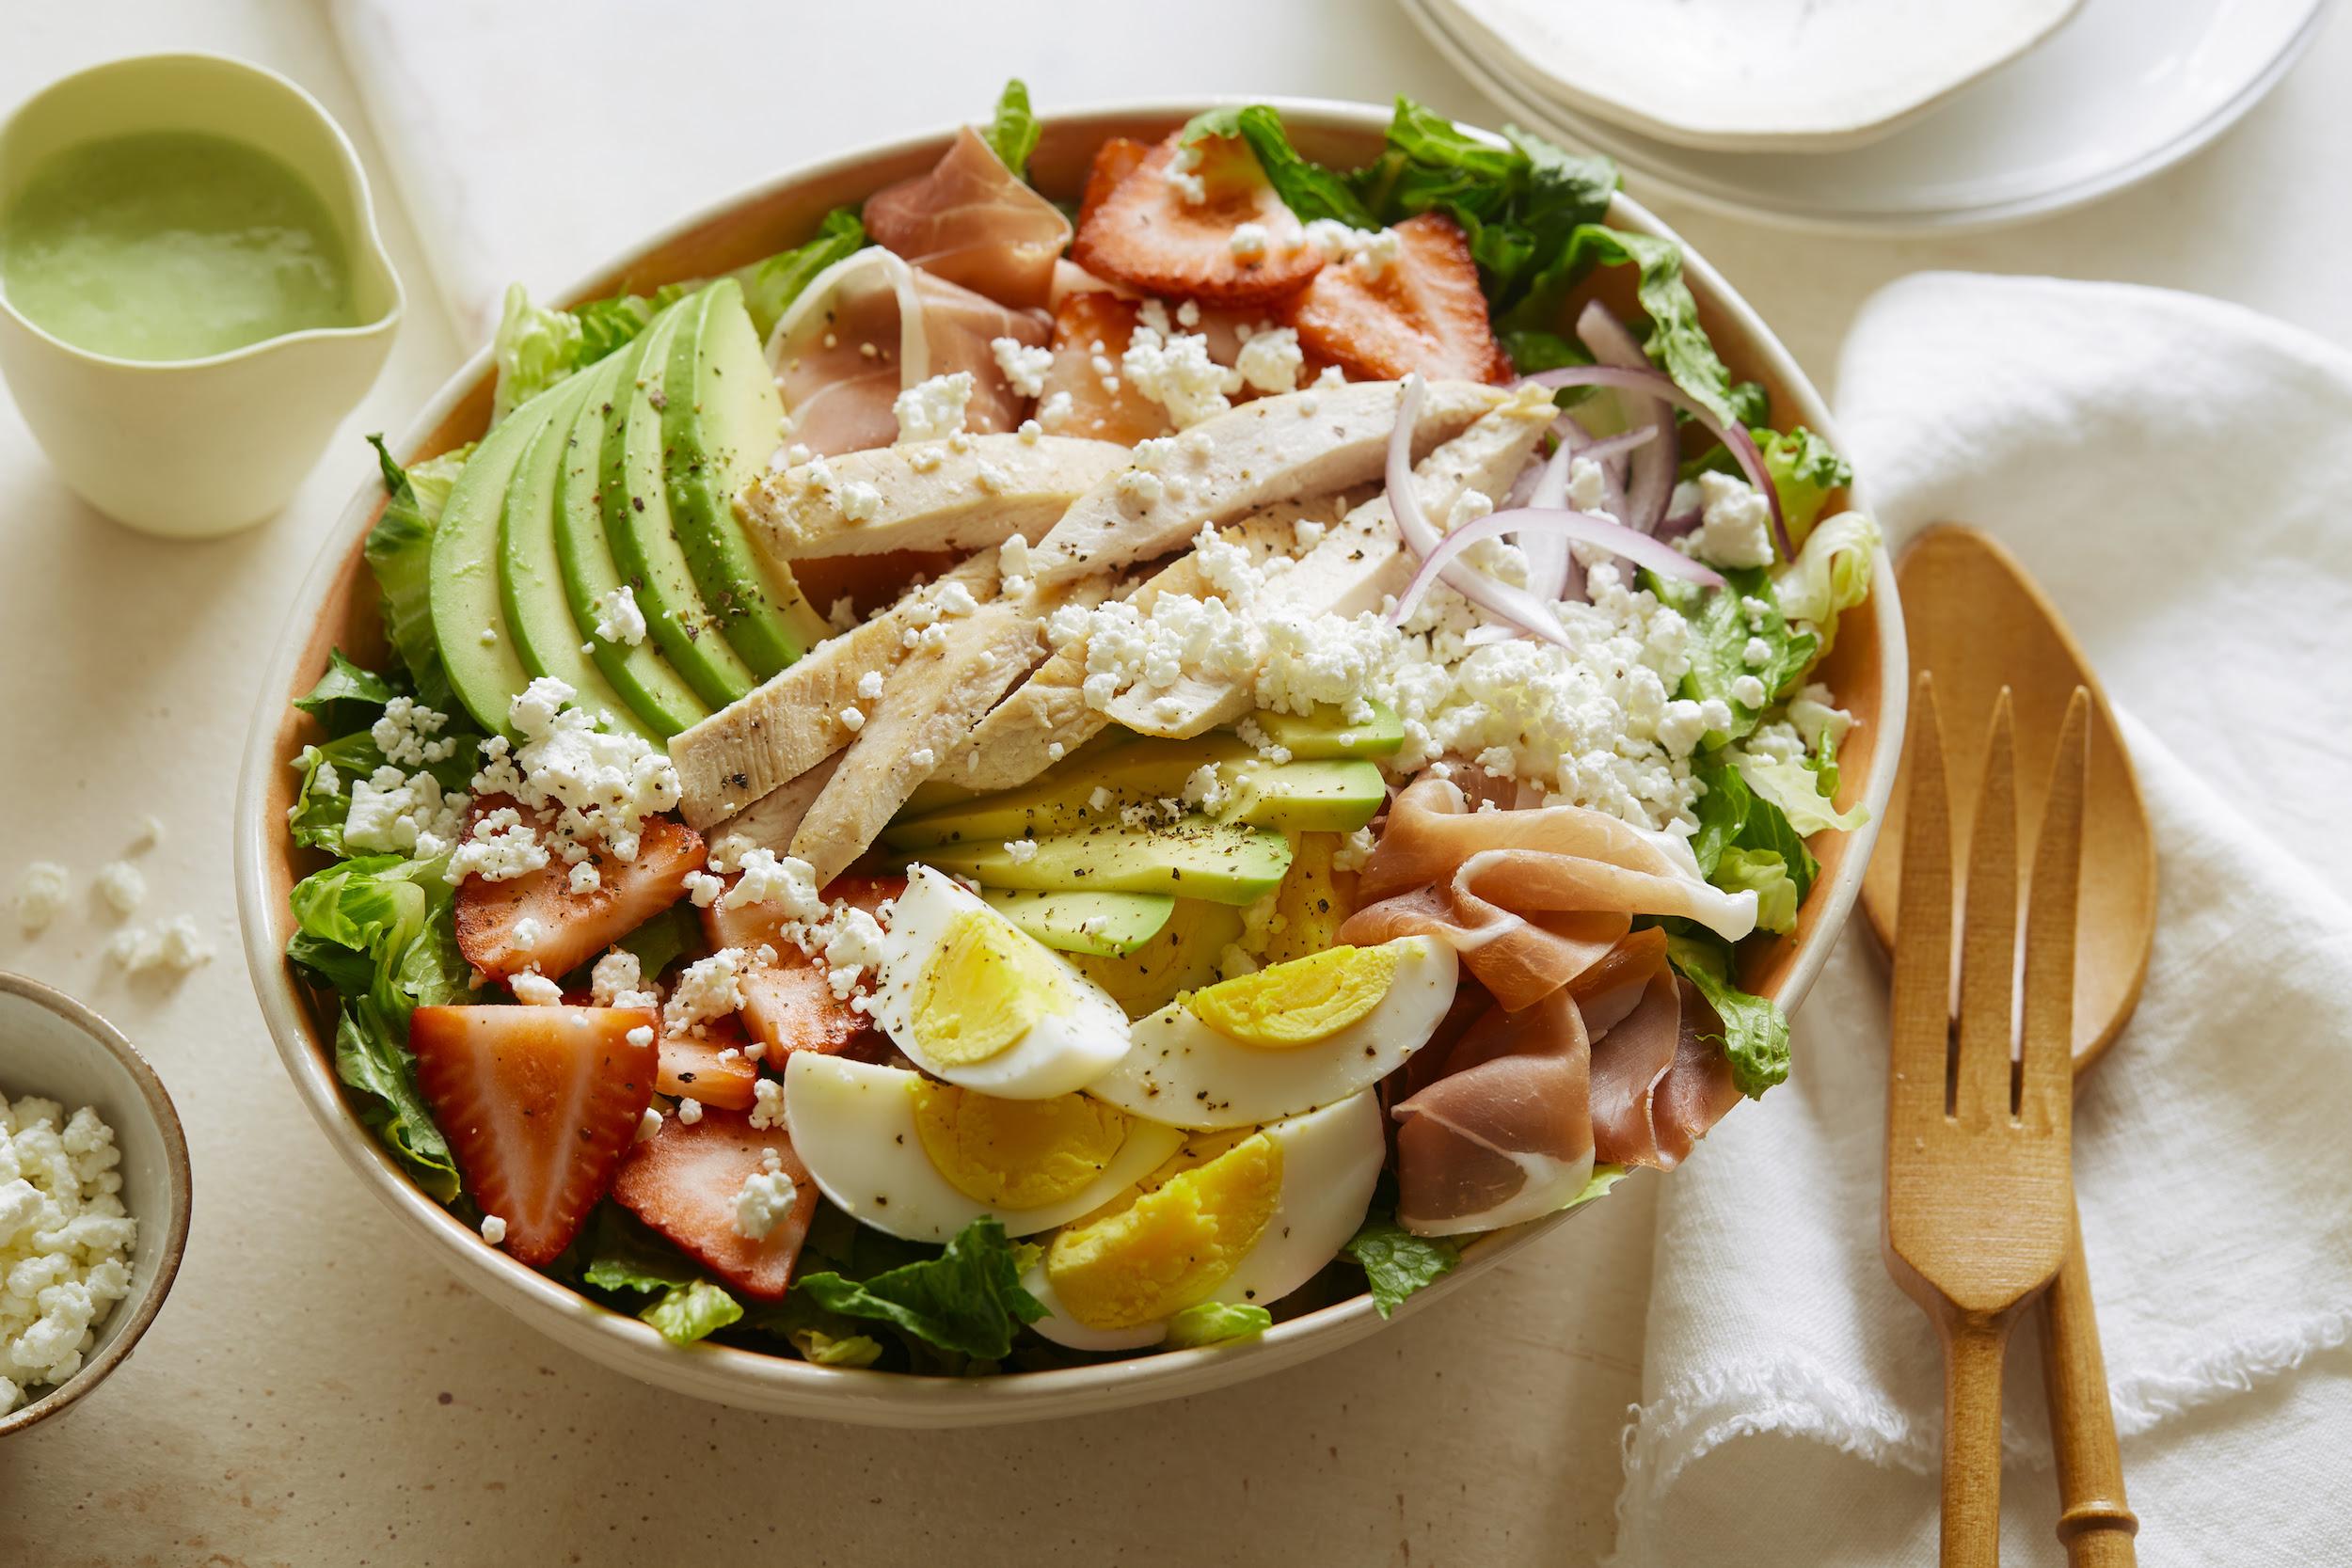 100+ Easy Summer Salad Recipes - Healthy Salad Ideas for ...